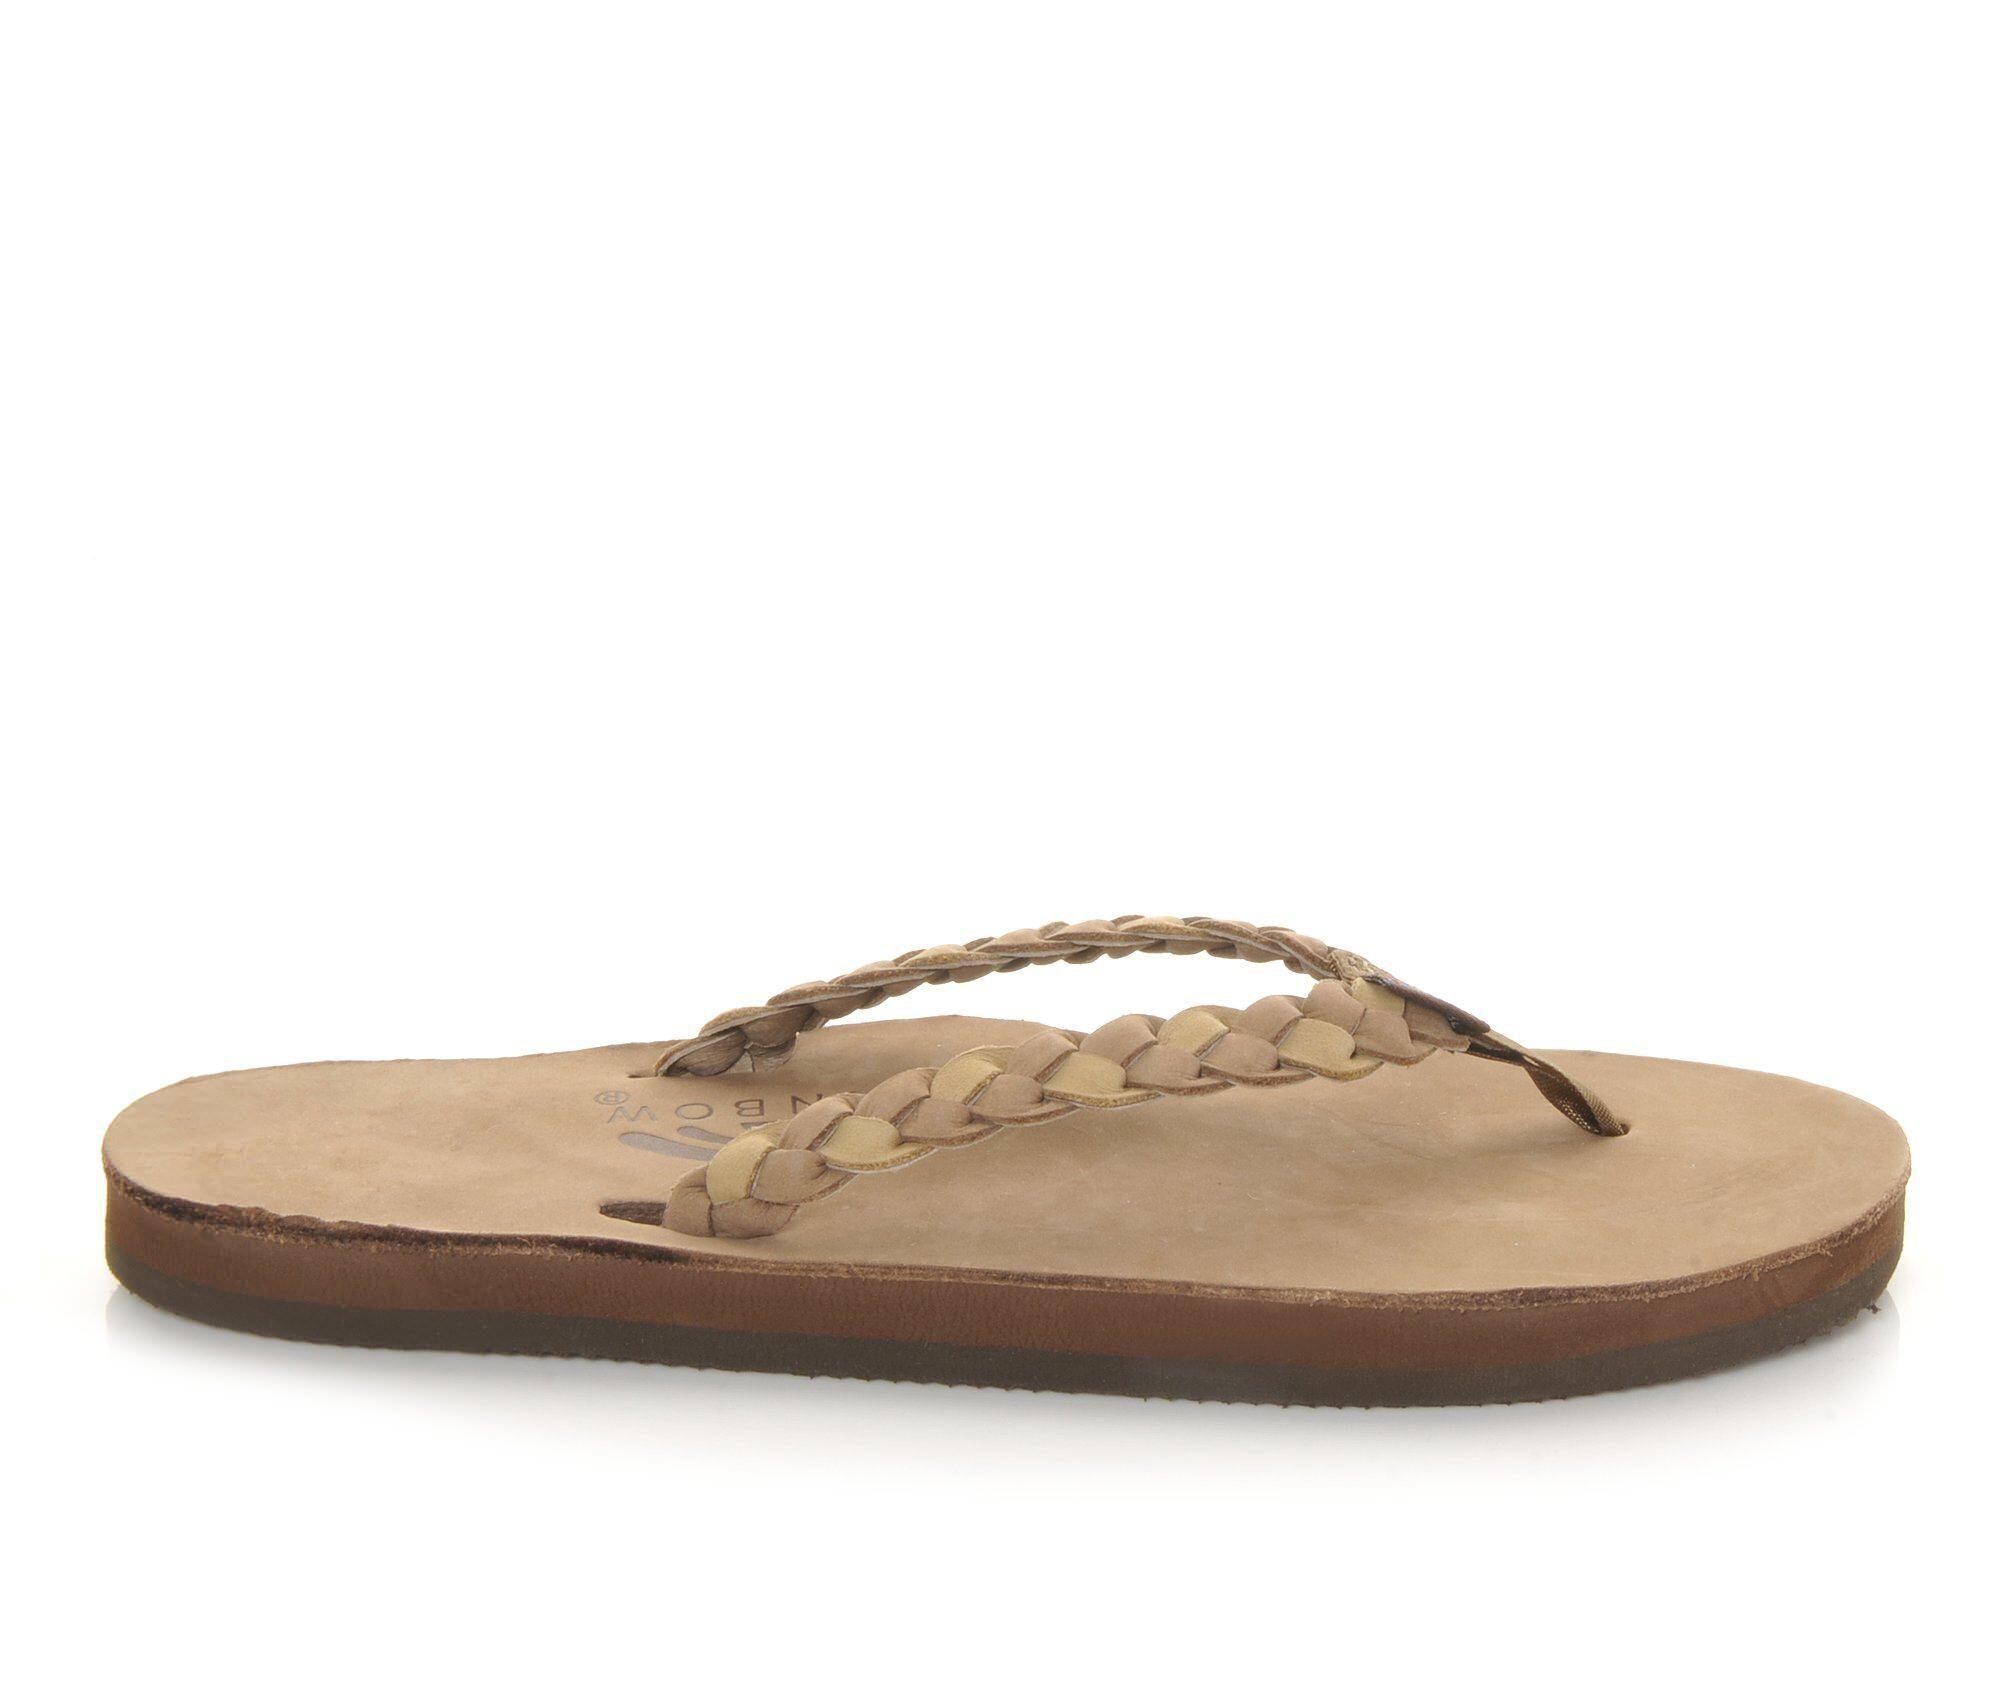 Ladies twisted strap flat flip flops sandals   MKWHQ83W6